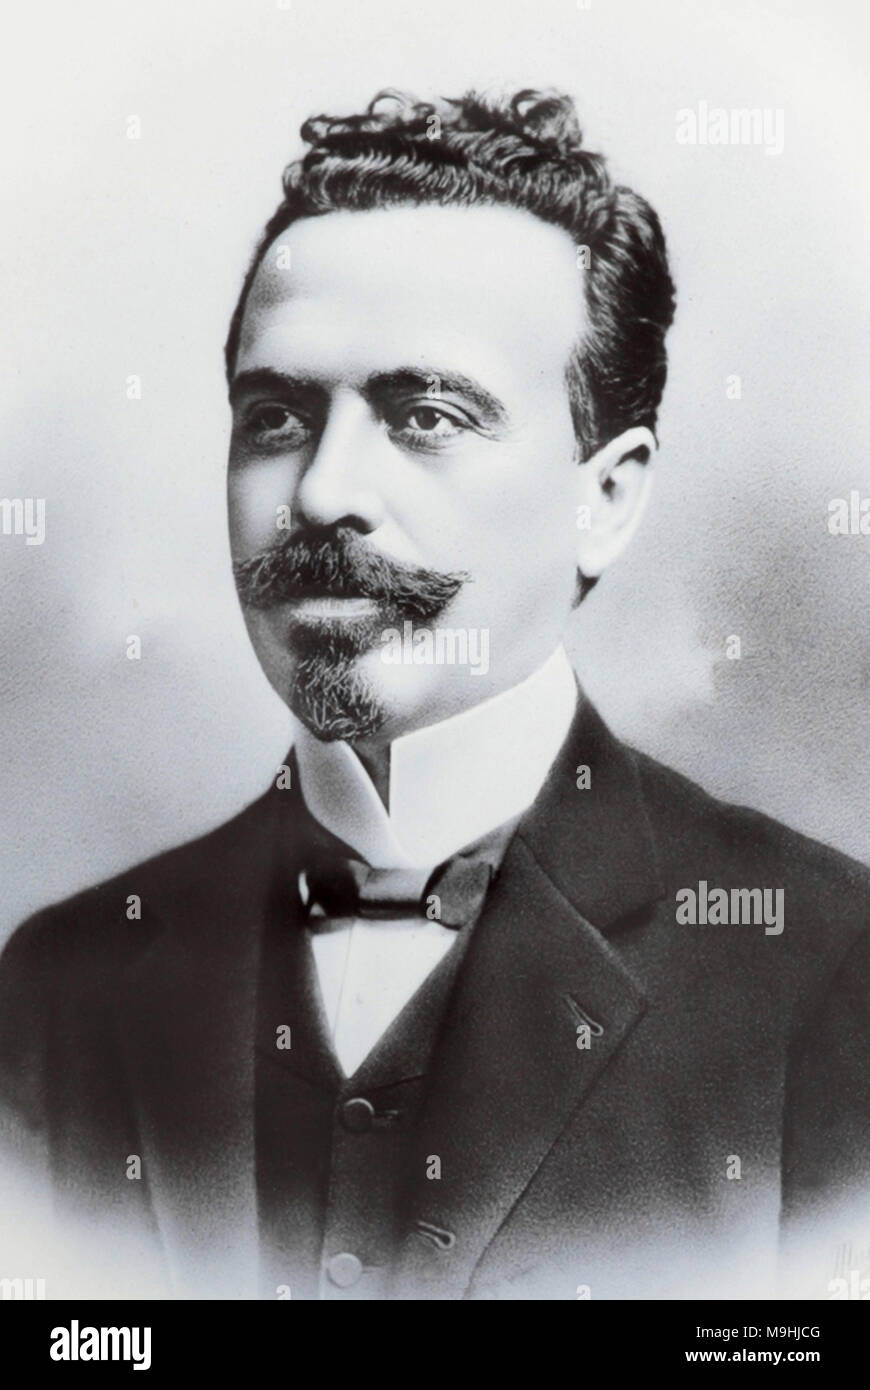 Nilo Procópio Peçanha (1867 – 1924) Brazilian politician who served as 7th President of Brazil. - Stock Image